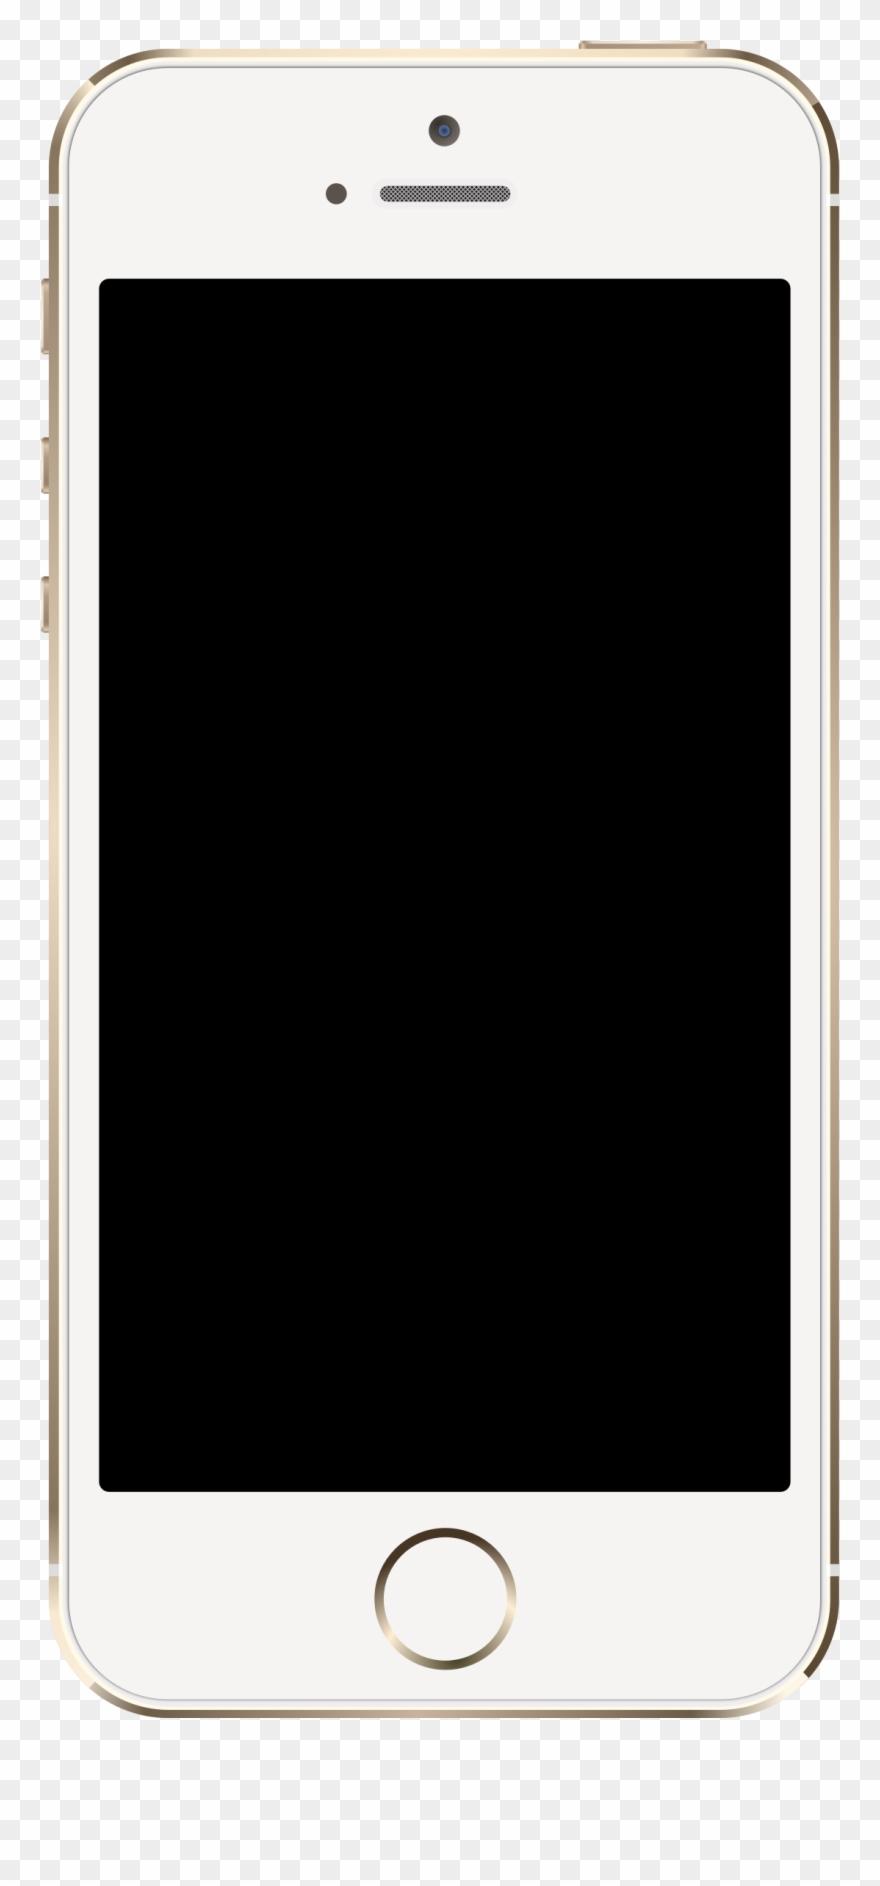 5s clipart png image transparent download Iphone 5s Clip Art Gallery - Png Download (#253538) - PinClipart image transparent download